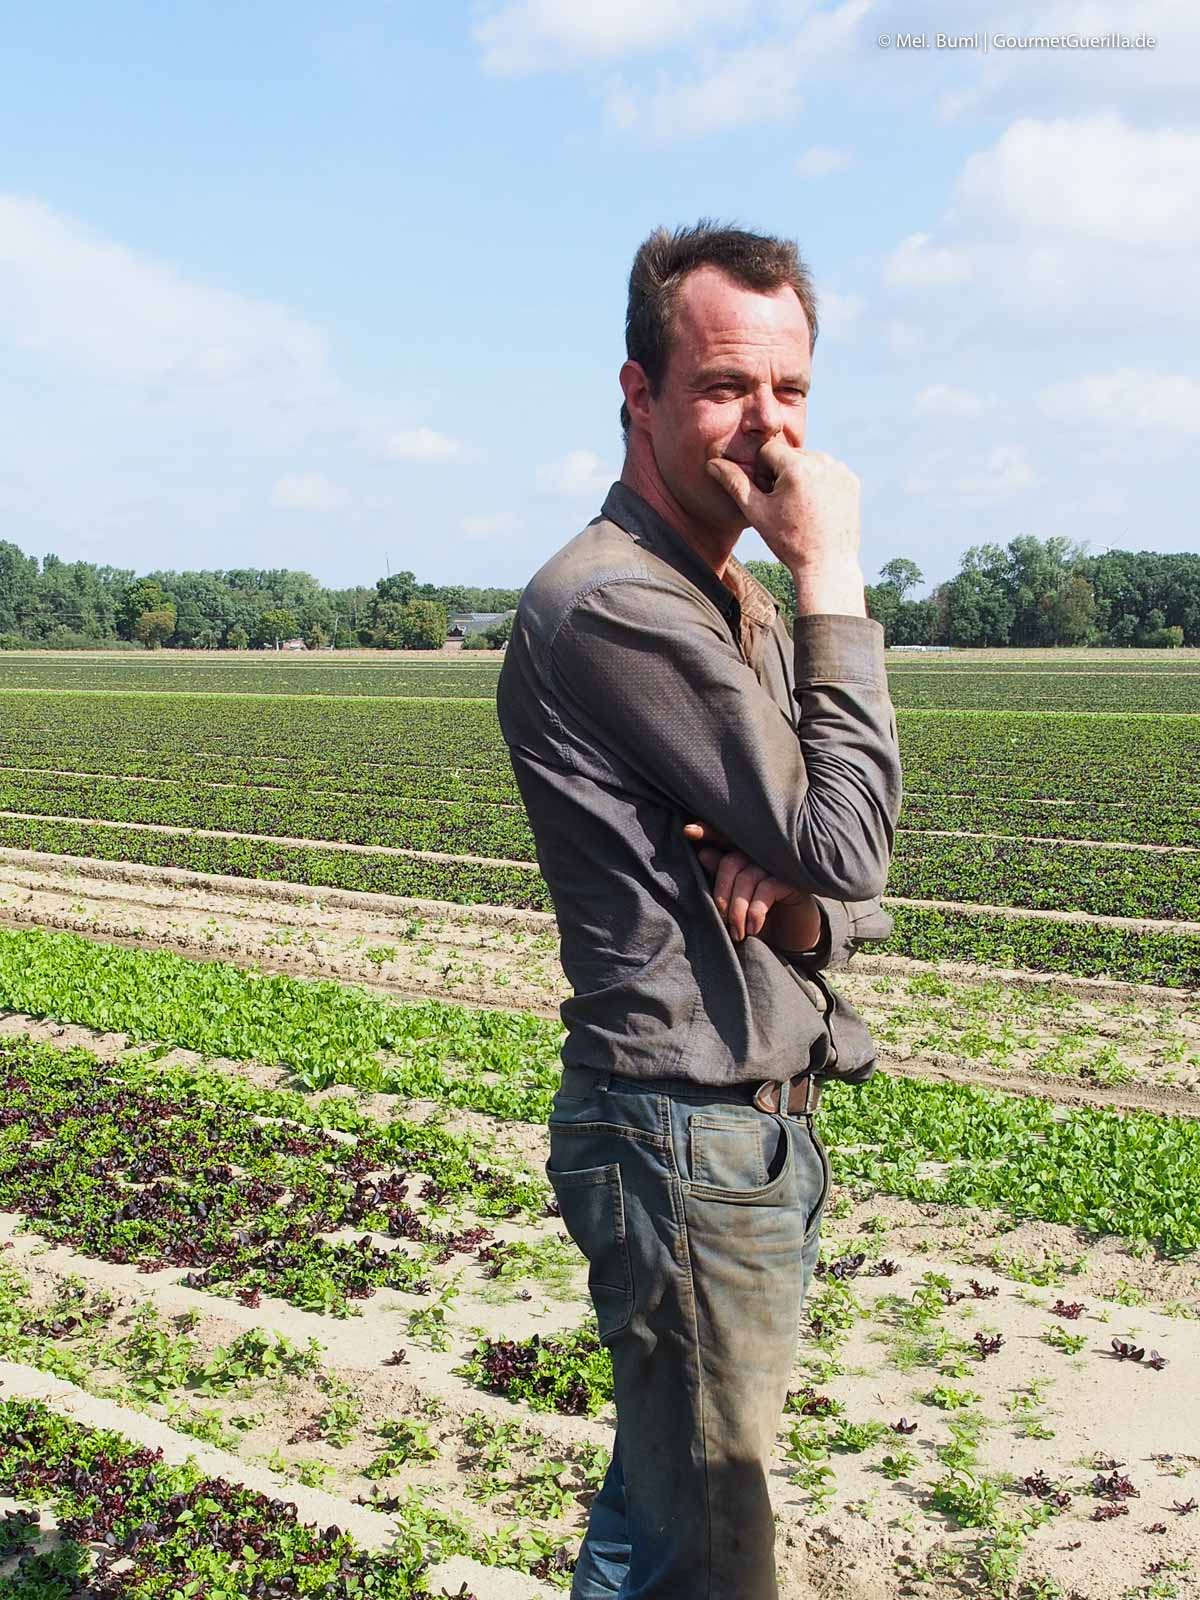 Salatbauer Salatmischung auf dem Feld Eisbergsalat auf dem Feld Bonduelle Academy Salat Anbau und Verarbeitung |GourmetGuerilla.de